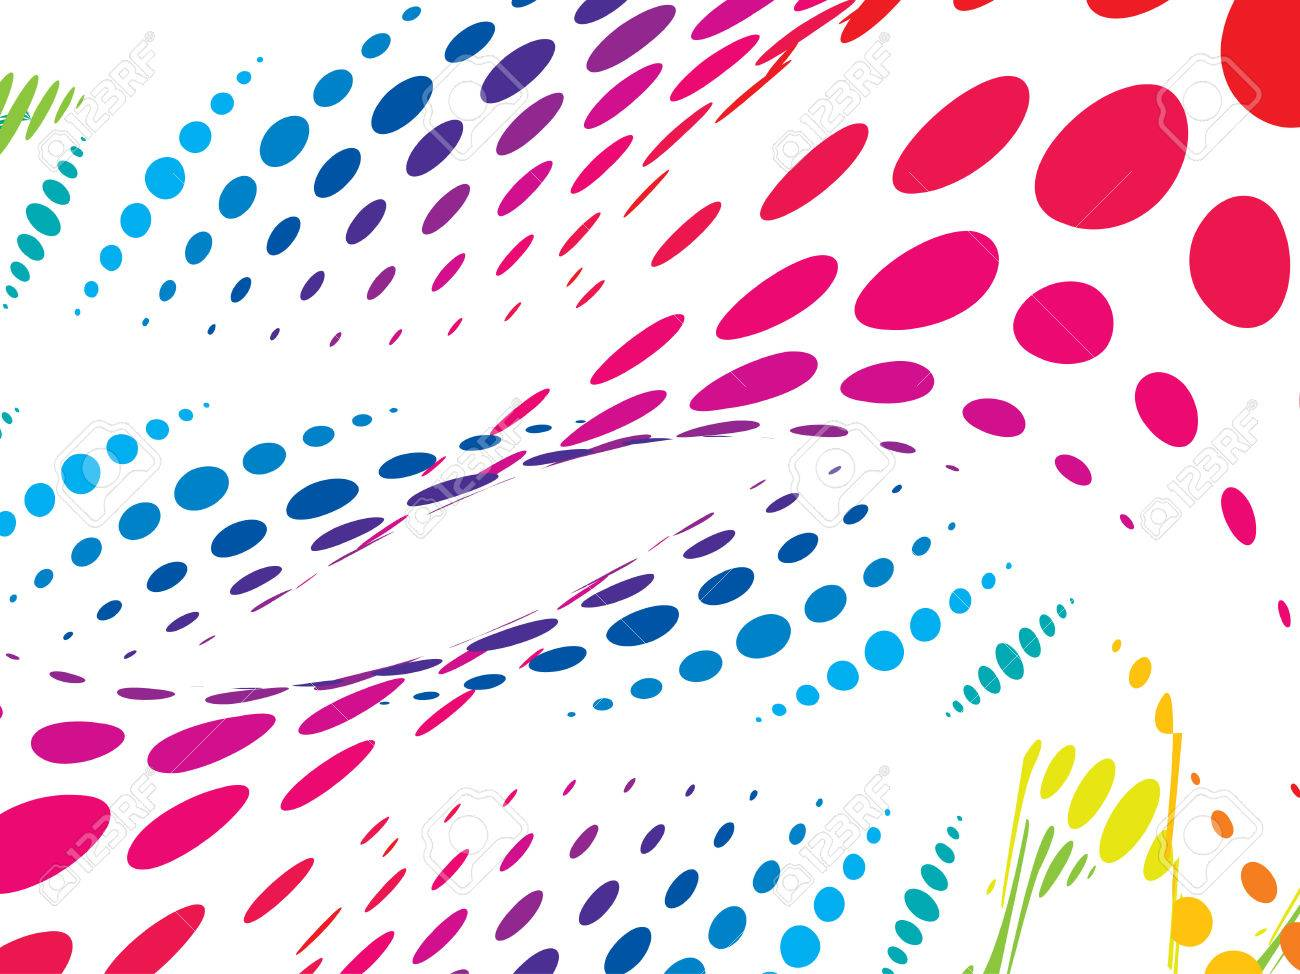 Color halftone printing - Vector Multi Color Wave Halftone Background